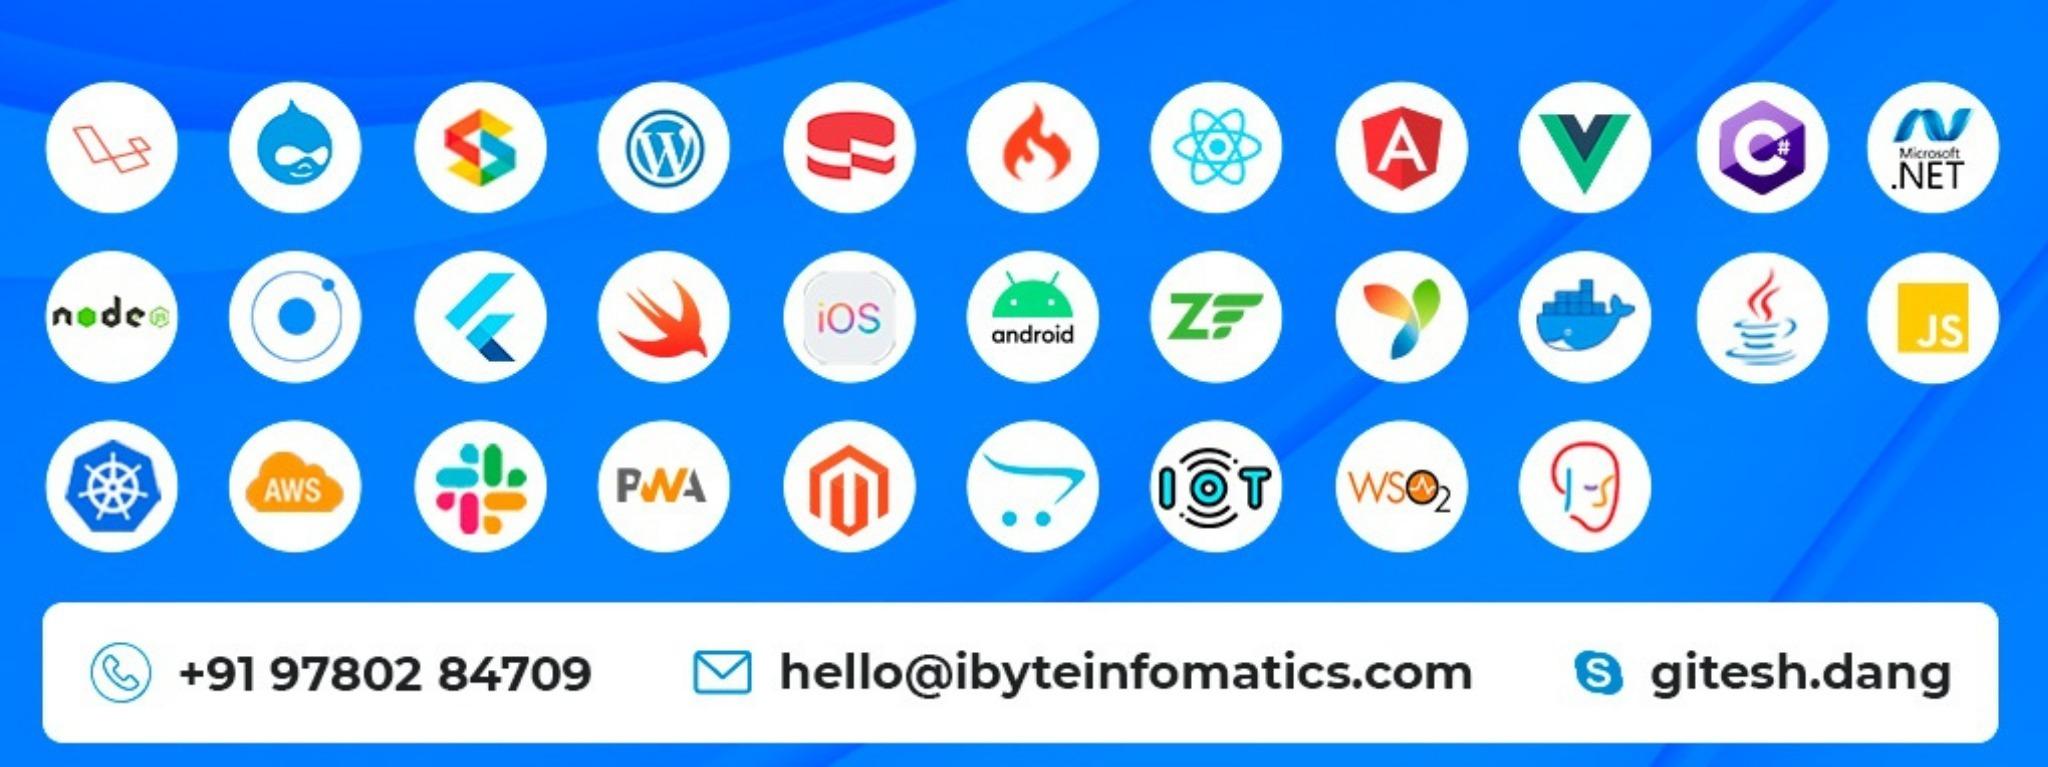 iByte Infomatics (@ibyteinfomatics) Cover Image